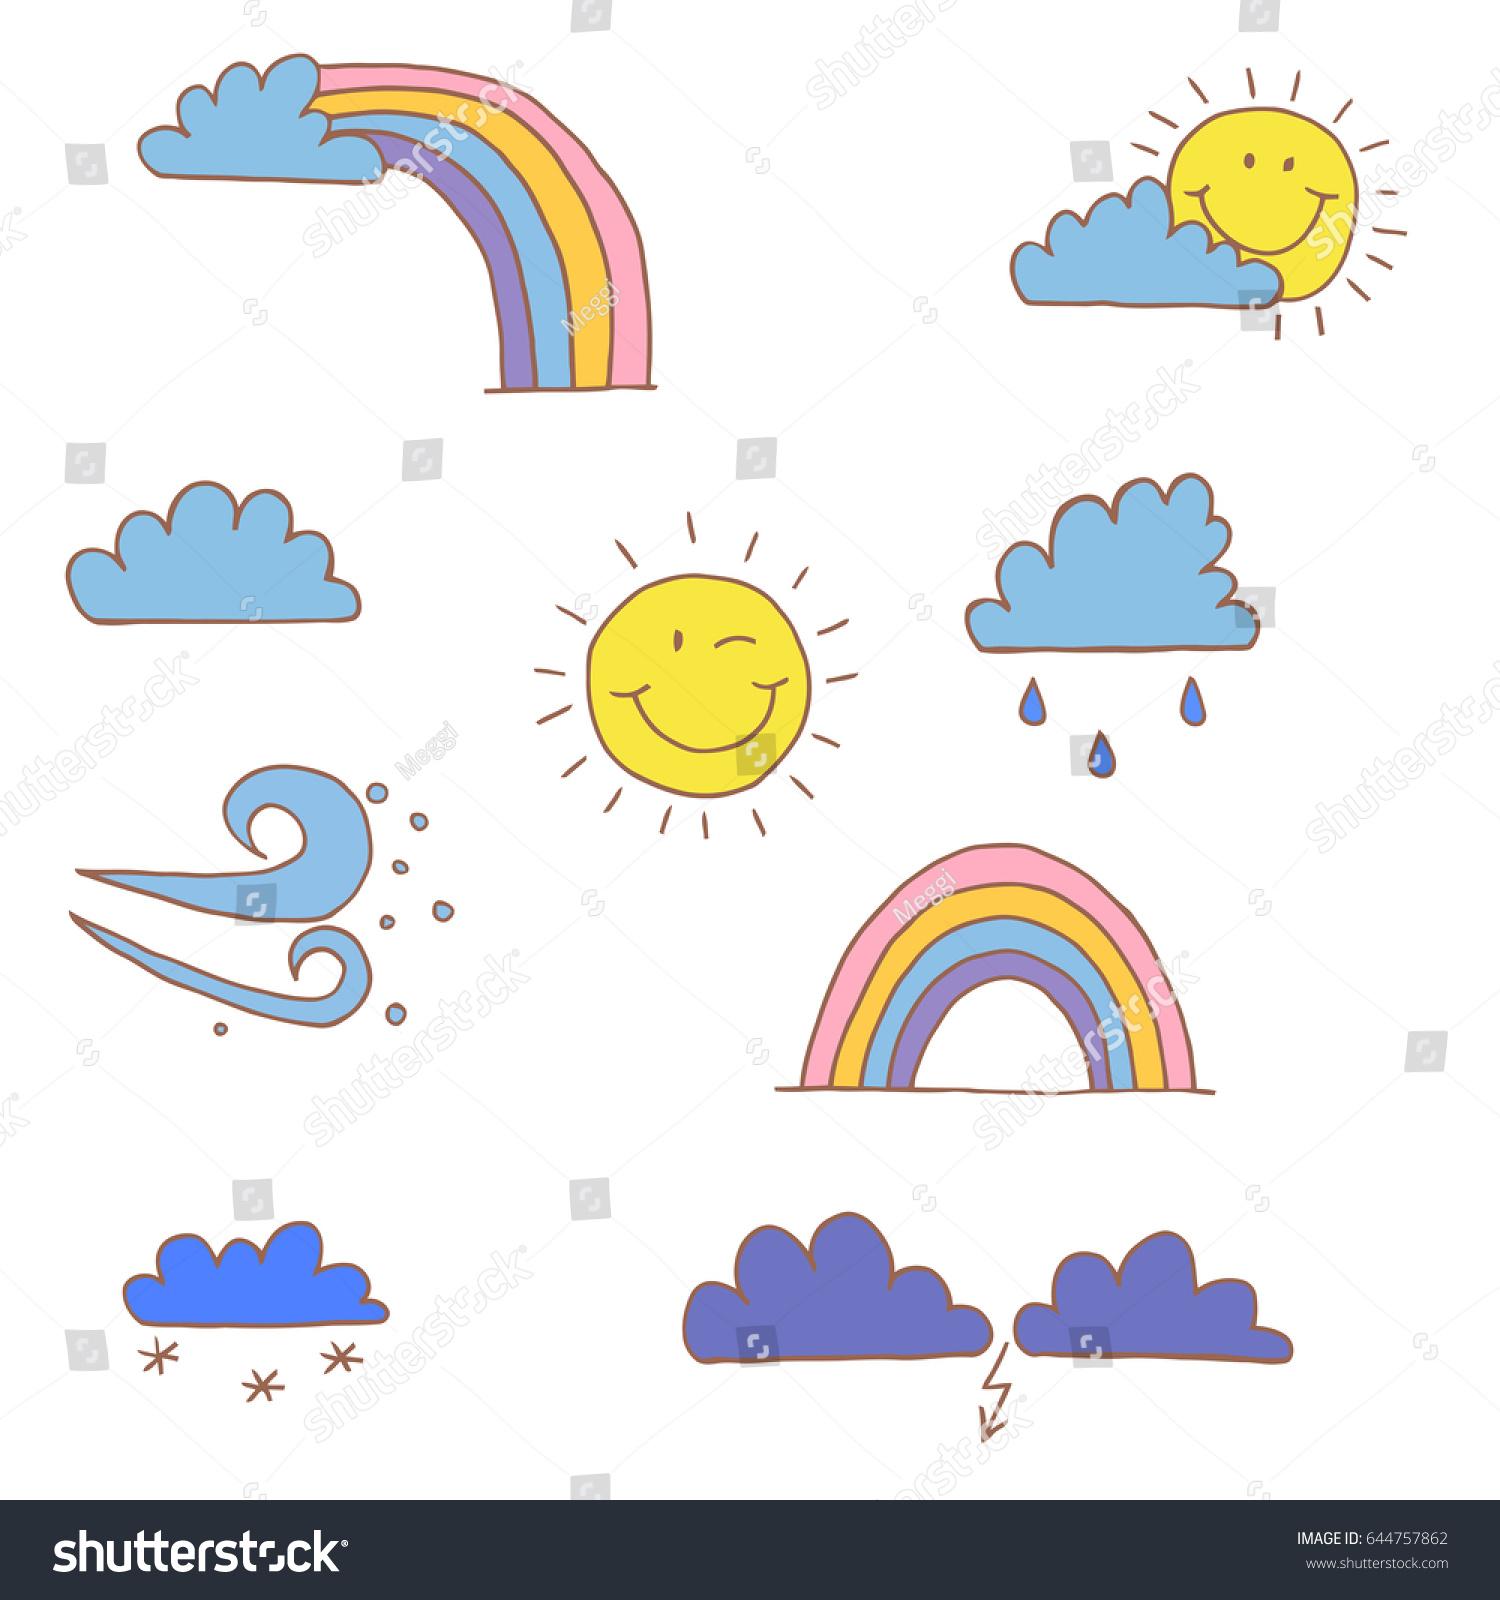 Cartoon Illustration Cute Weather Symbols Collection Stock